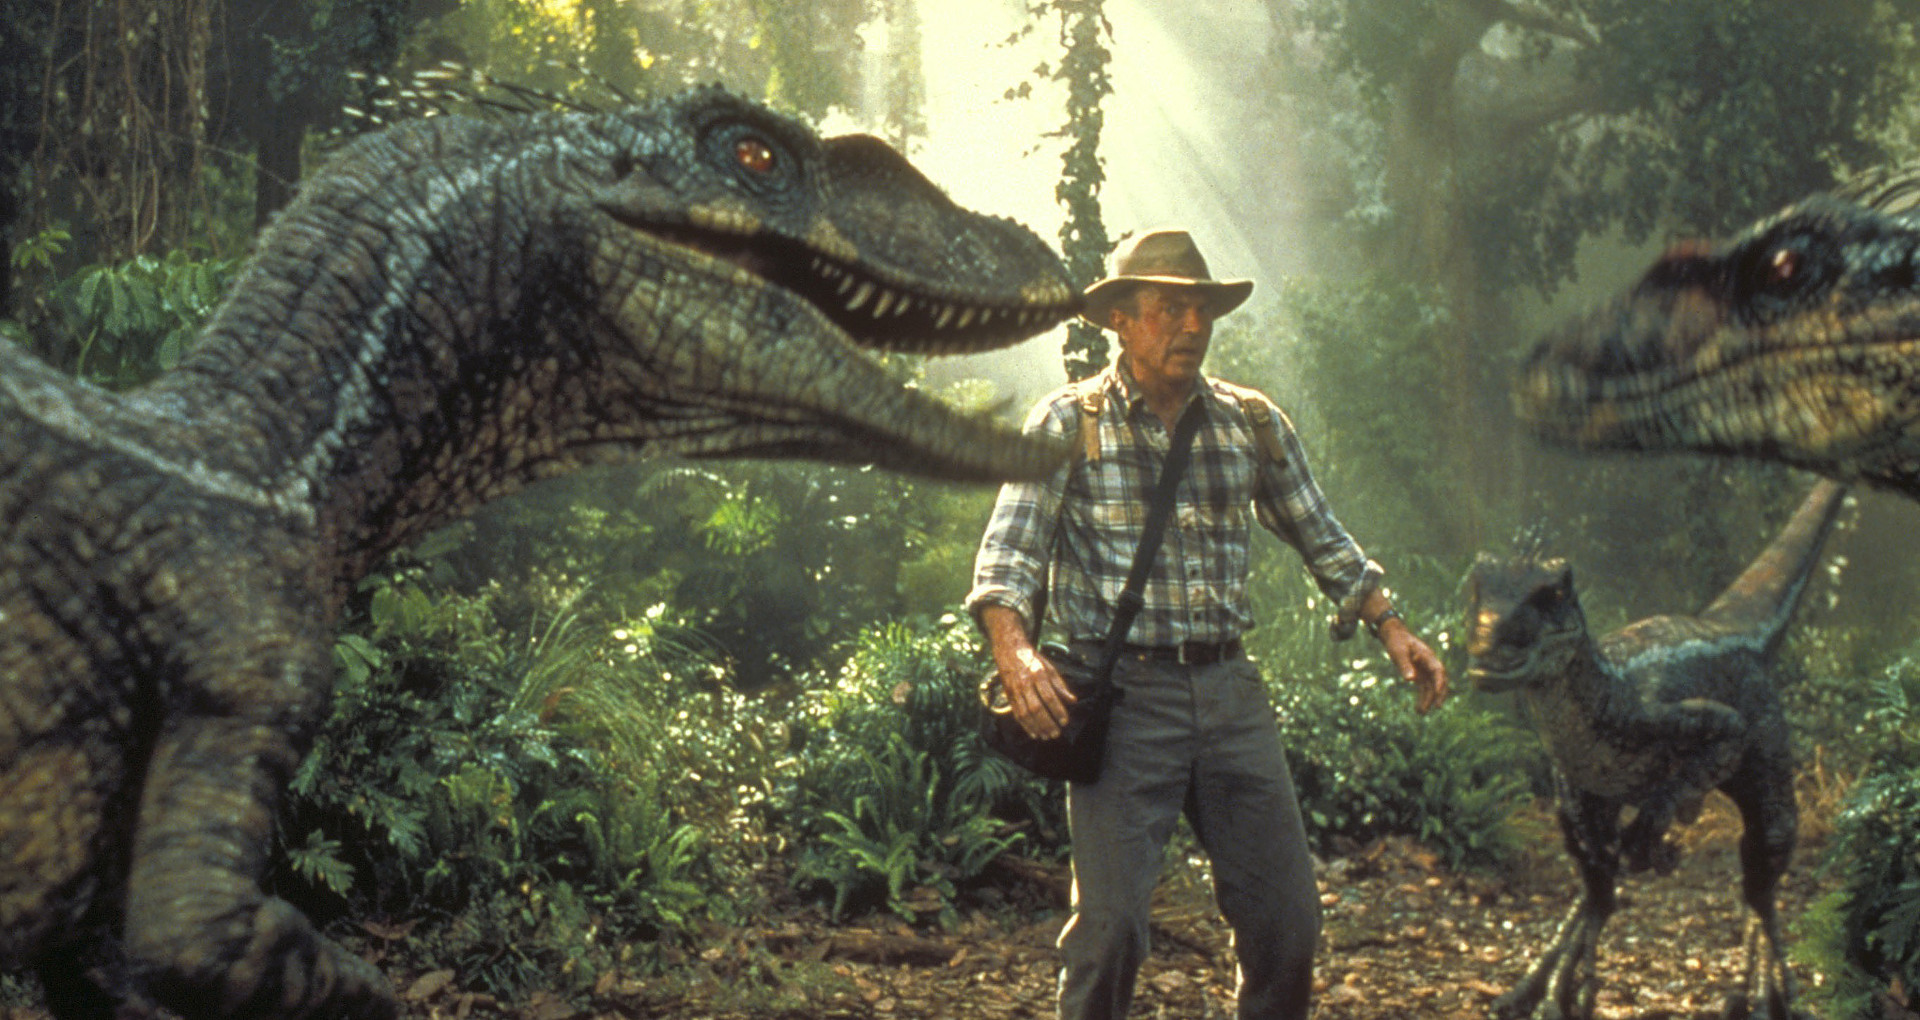 Man Vs Nature In Jurassic Park